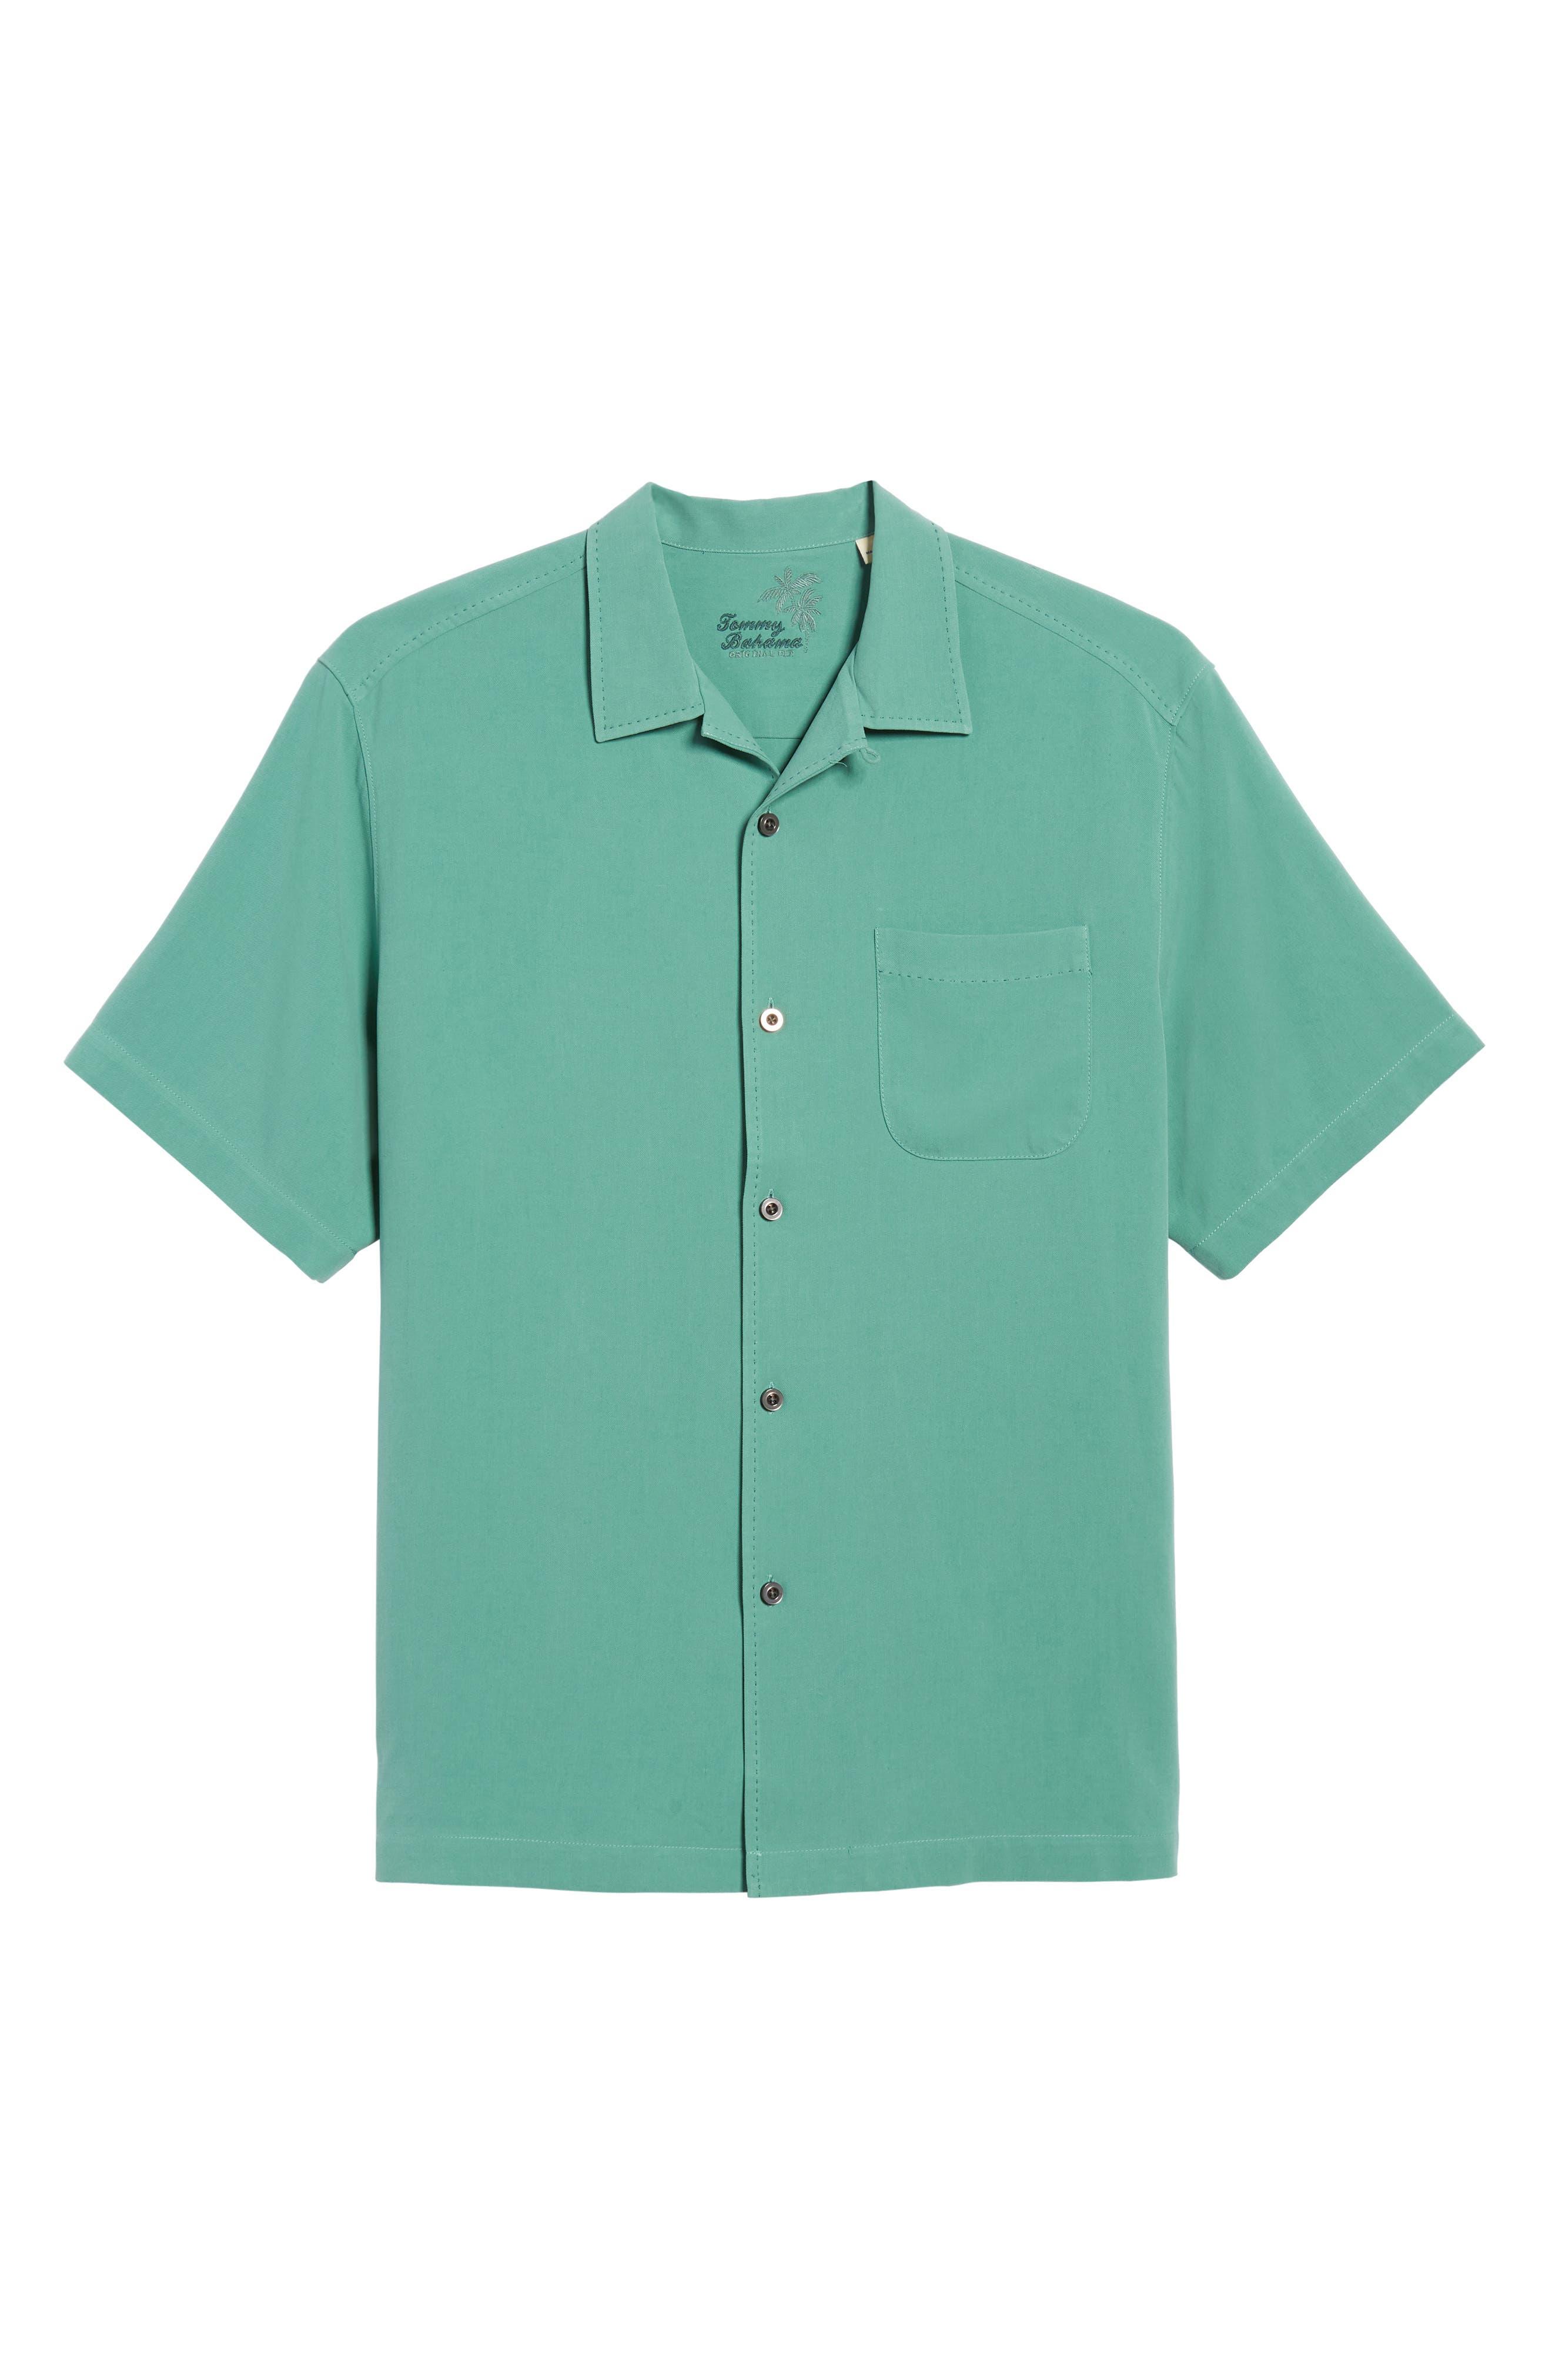 'Catalina Twill' Original Fit Silk Camp Shirt,                             Alternate thumbnail 6, color,                             306